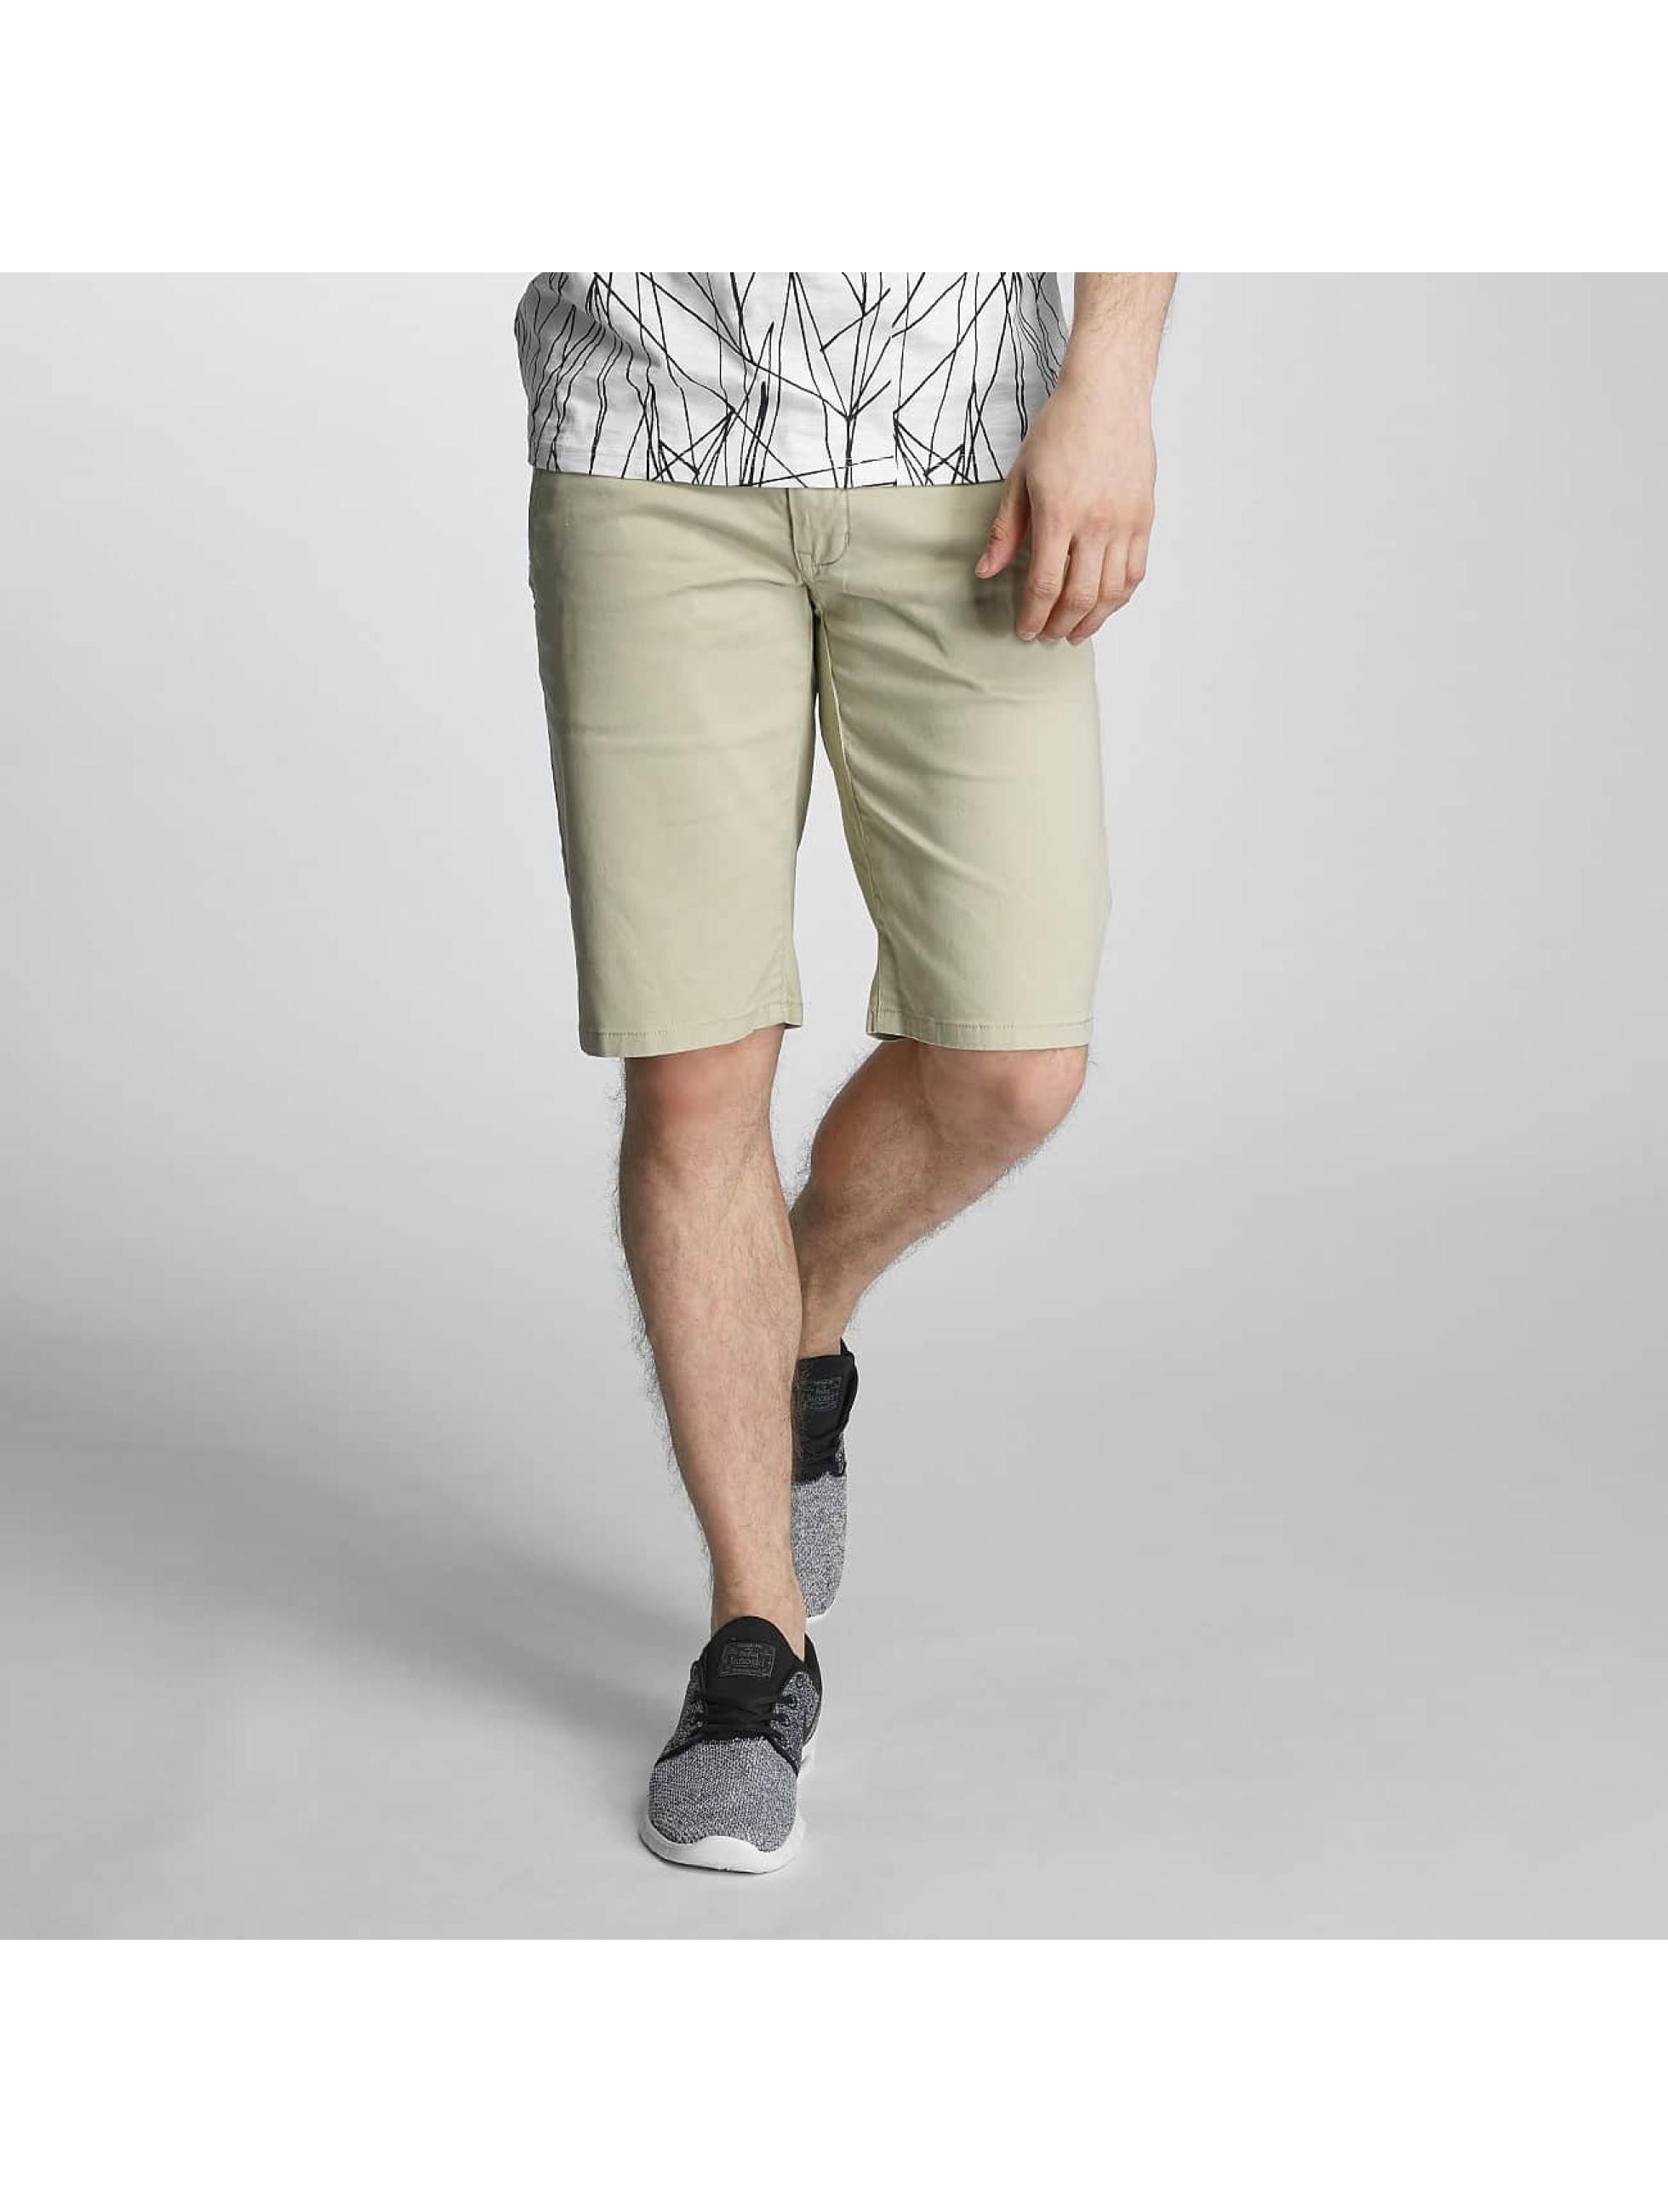 SHINE Original Detailed Strech Chino Shorts Sand